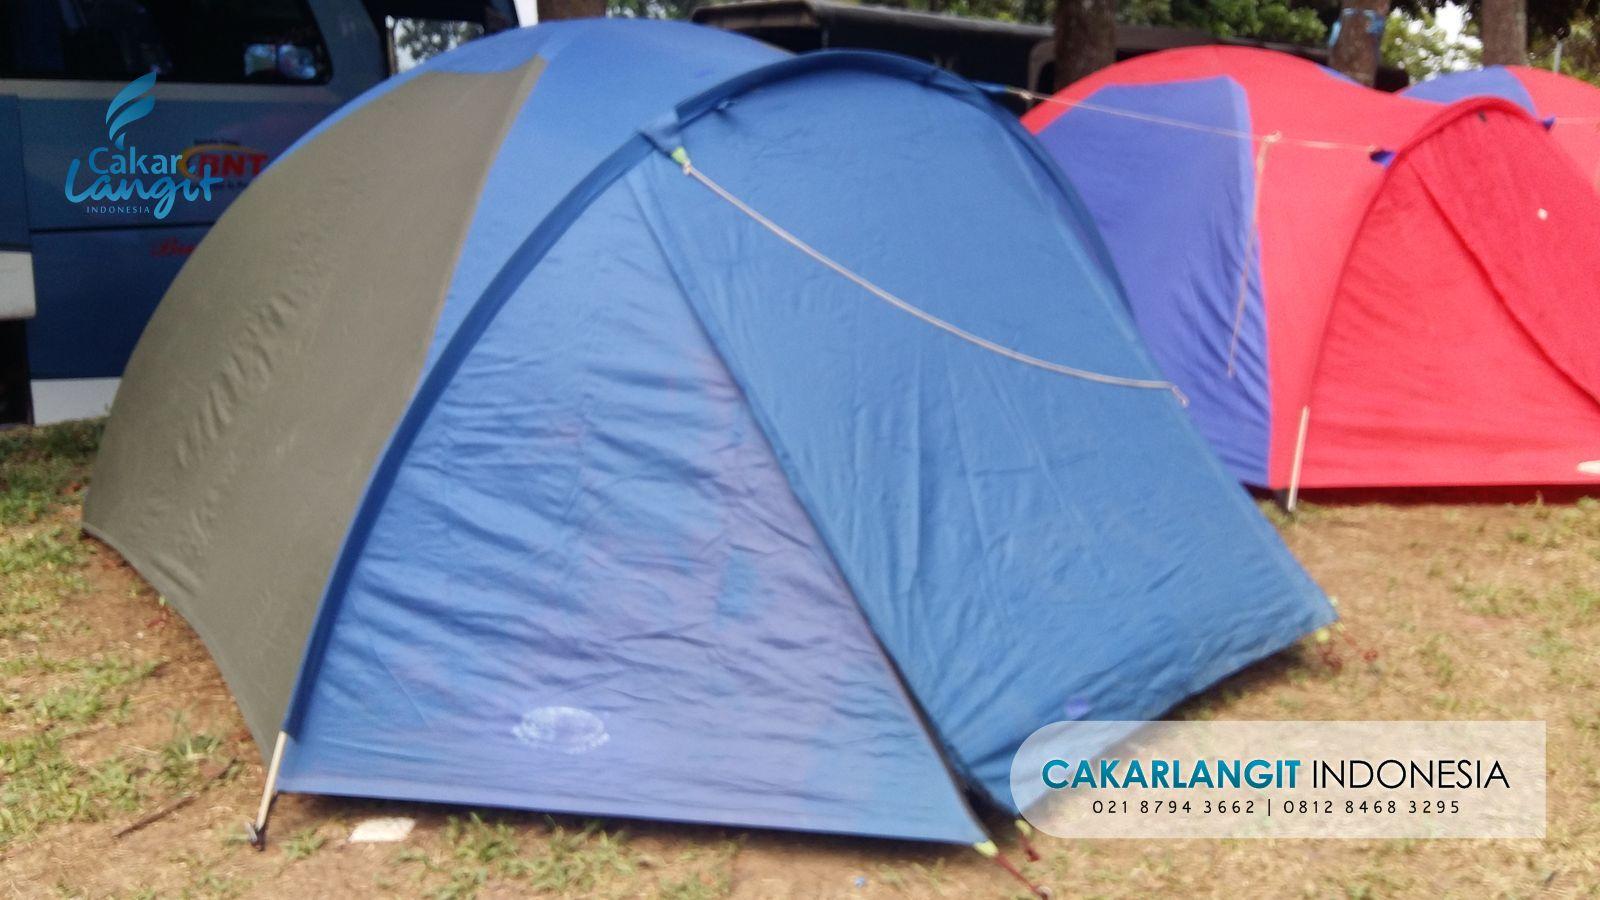 Tempat Sewa Perlengkapan Camping Murah Daerah Langensari Bandung Barat02198943662